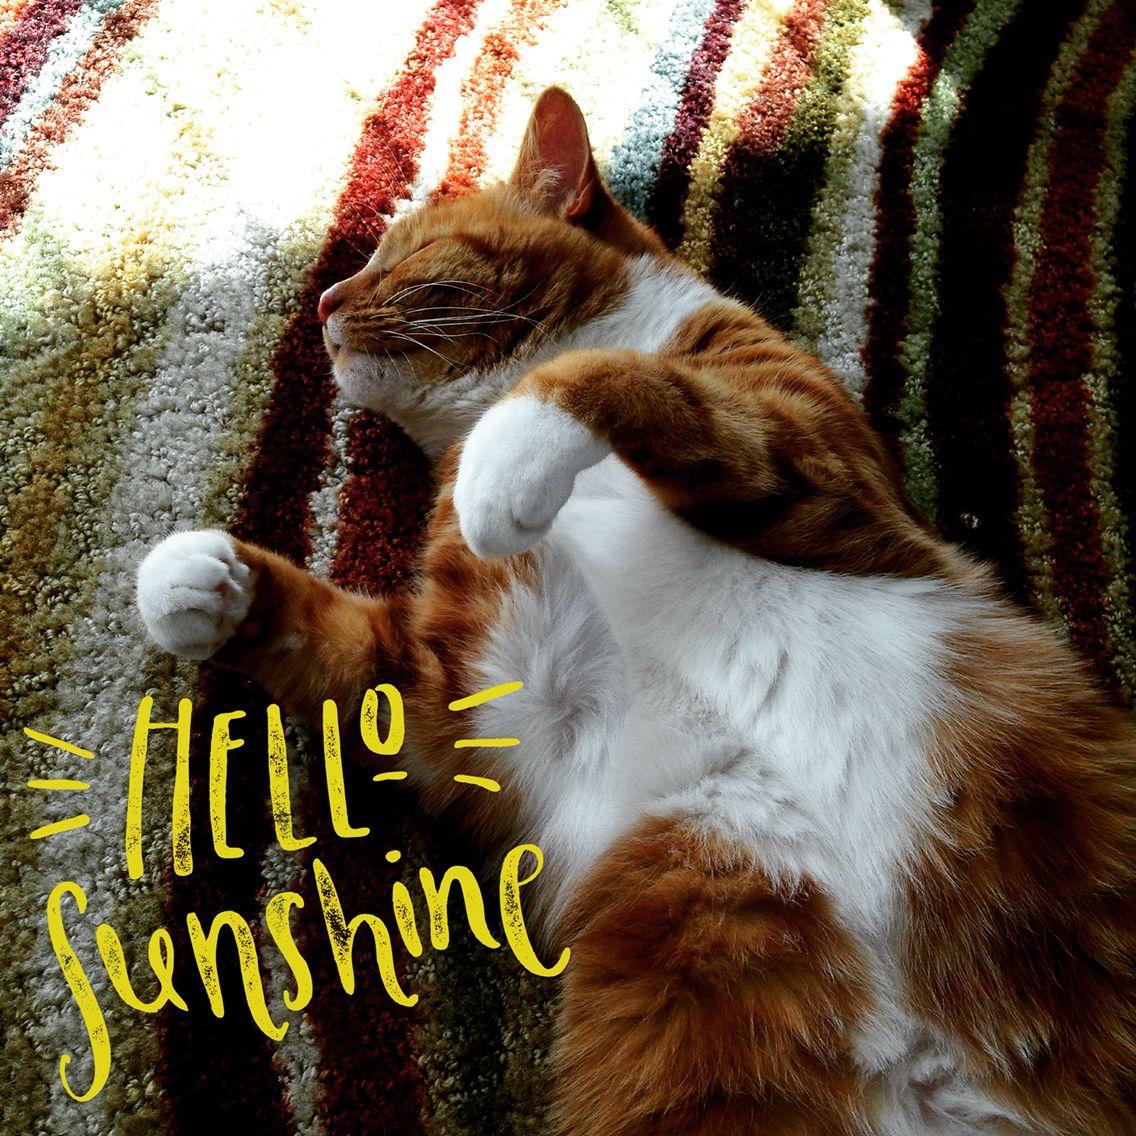 Hello Sunshine! What will U do 2day 4 self care? healthcoachlab.com Miami, Florida